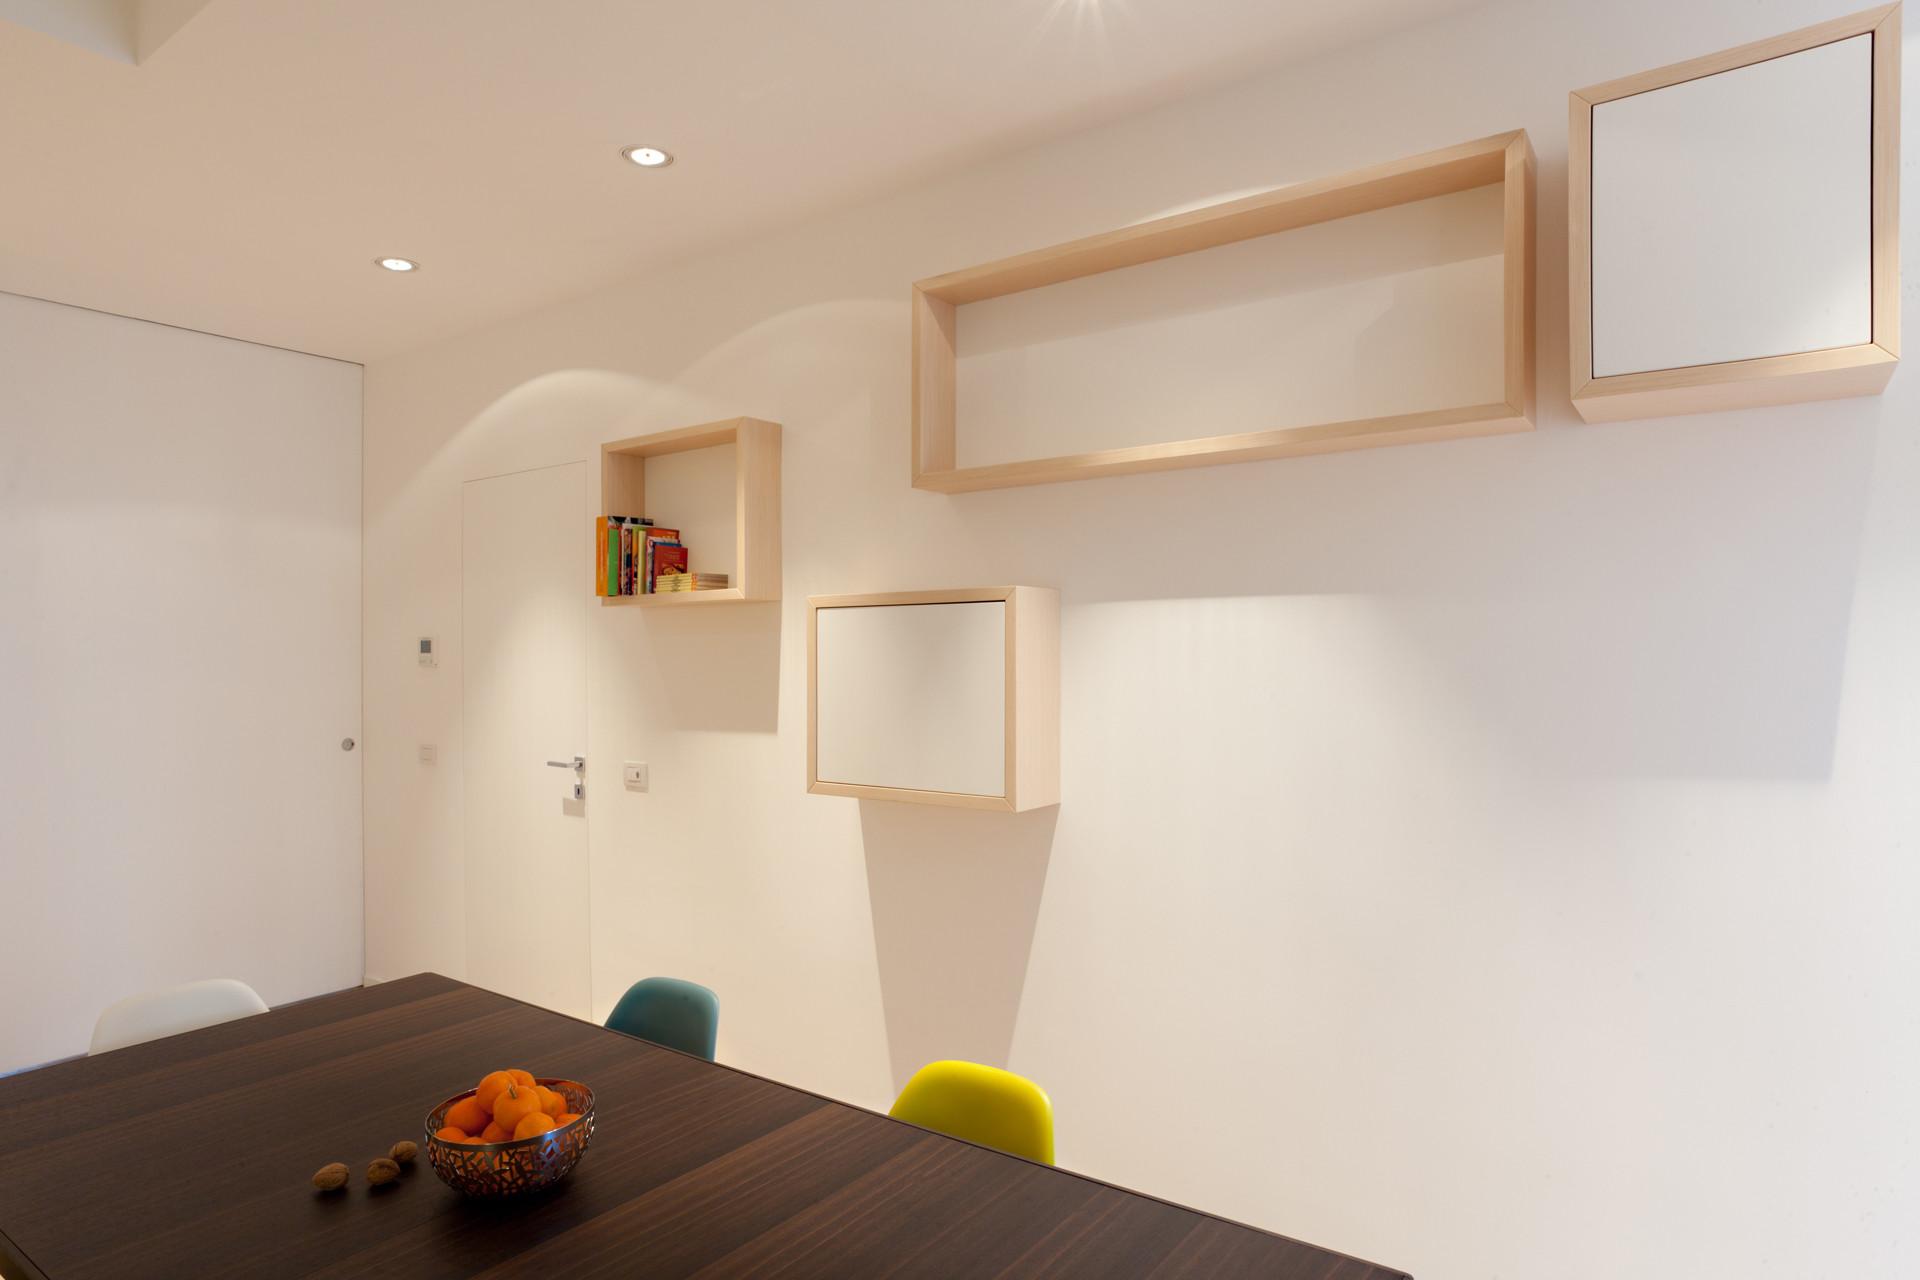 Wisp-Architects- Oxilia Apartment 10